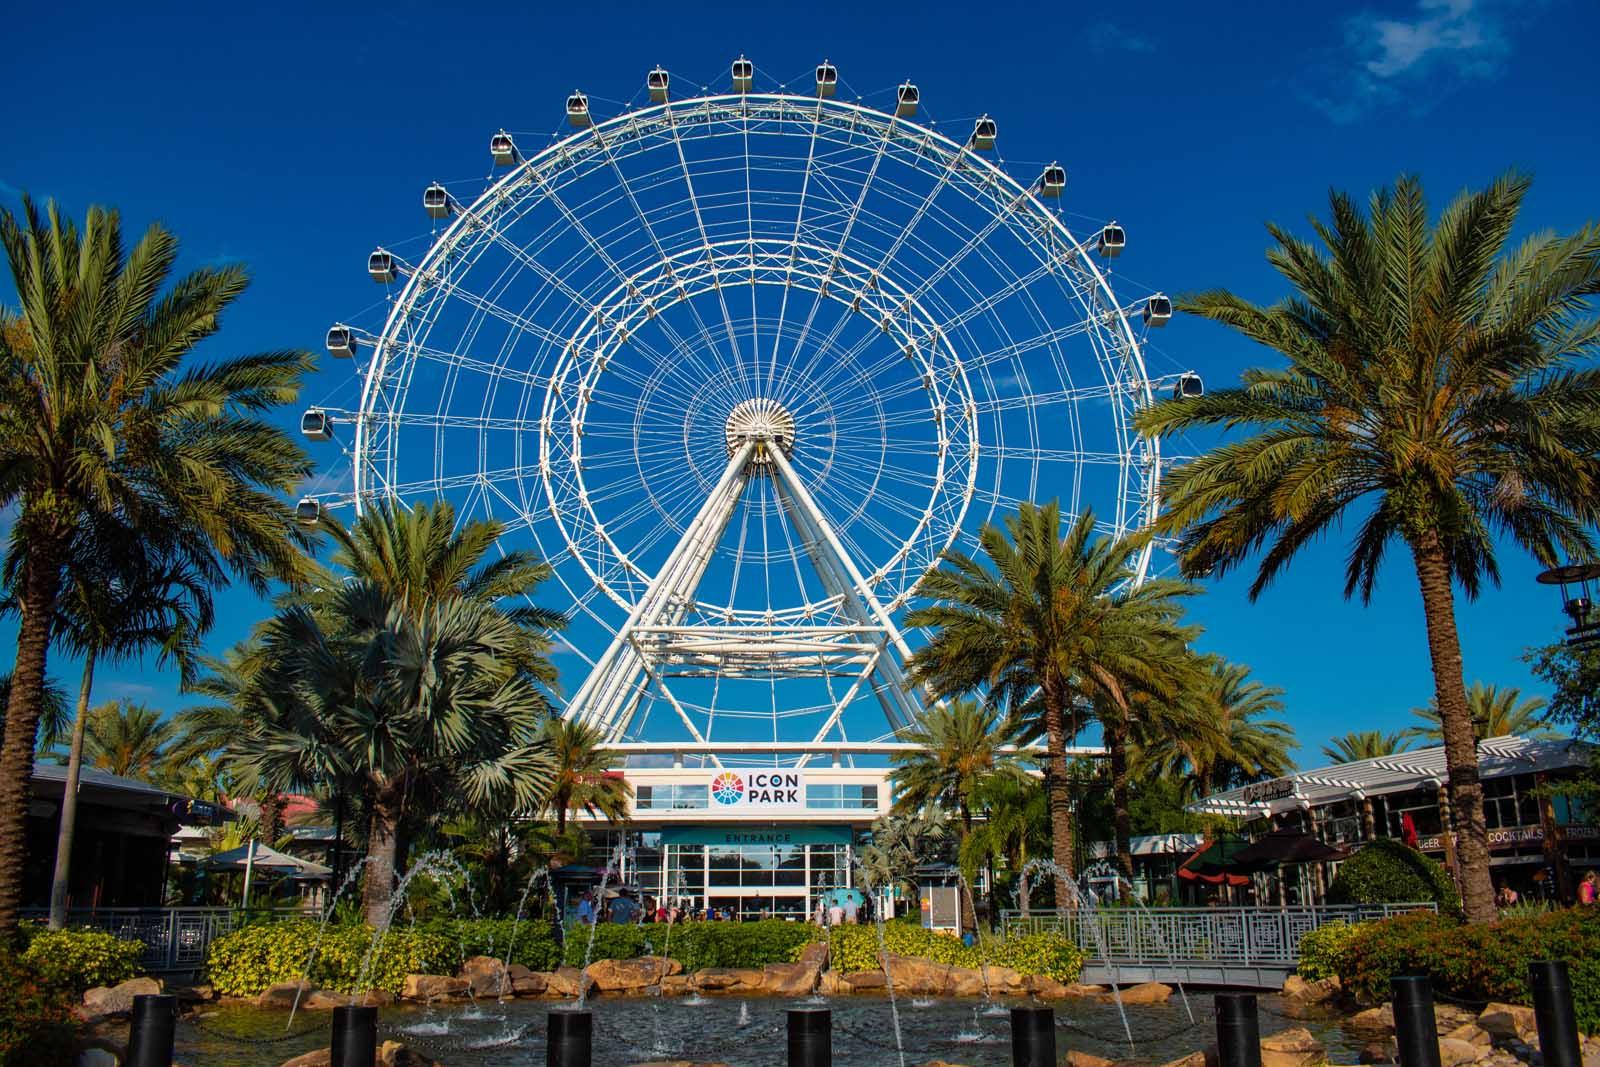 The Wheel at Icon Park in Orlando Florida